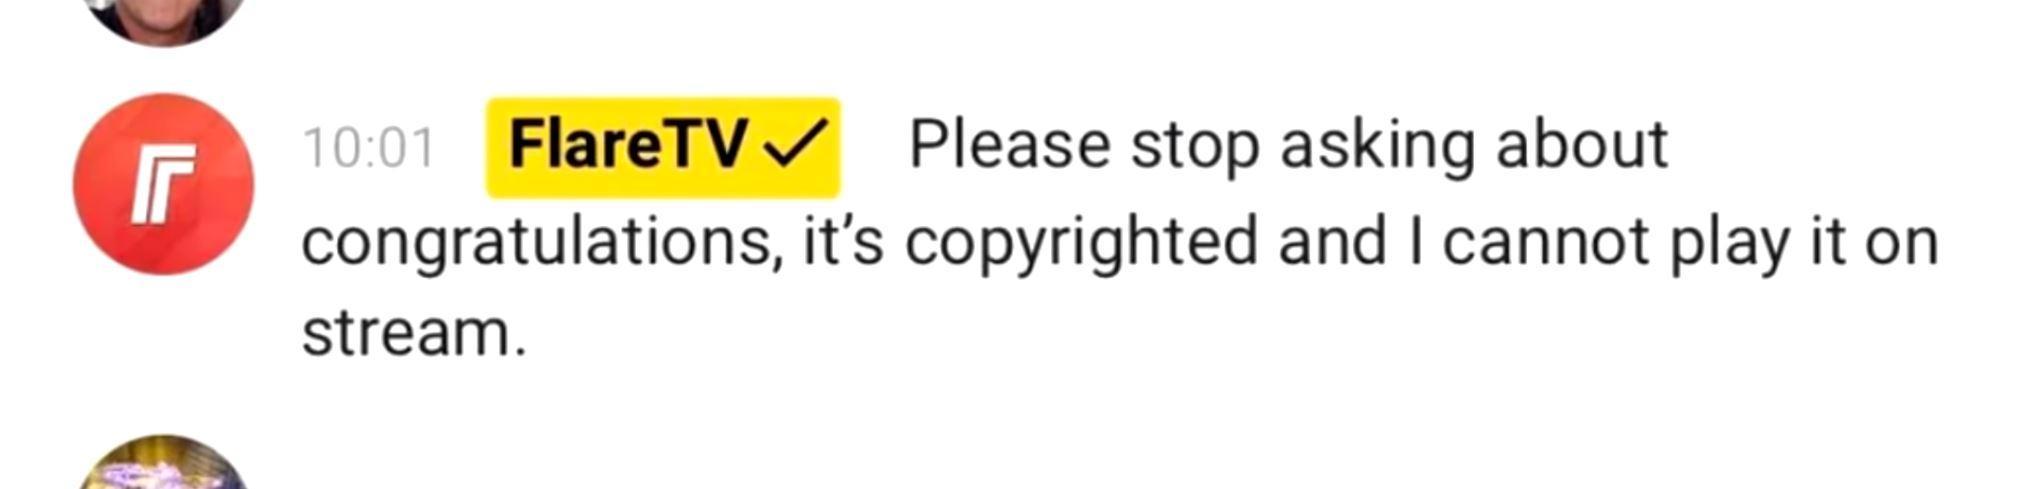 FlareTV, YouTube / Drama Alert, YouTube